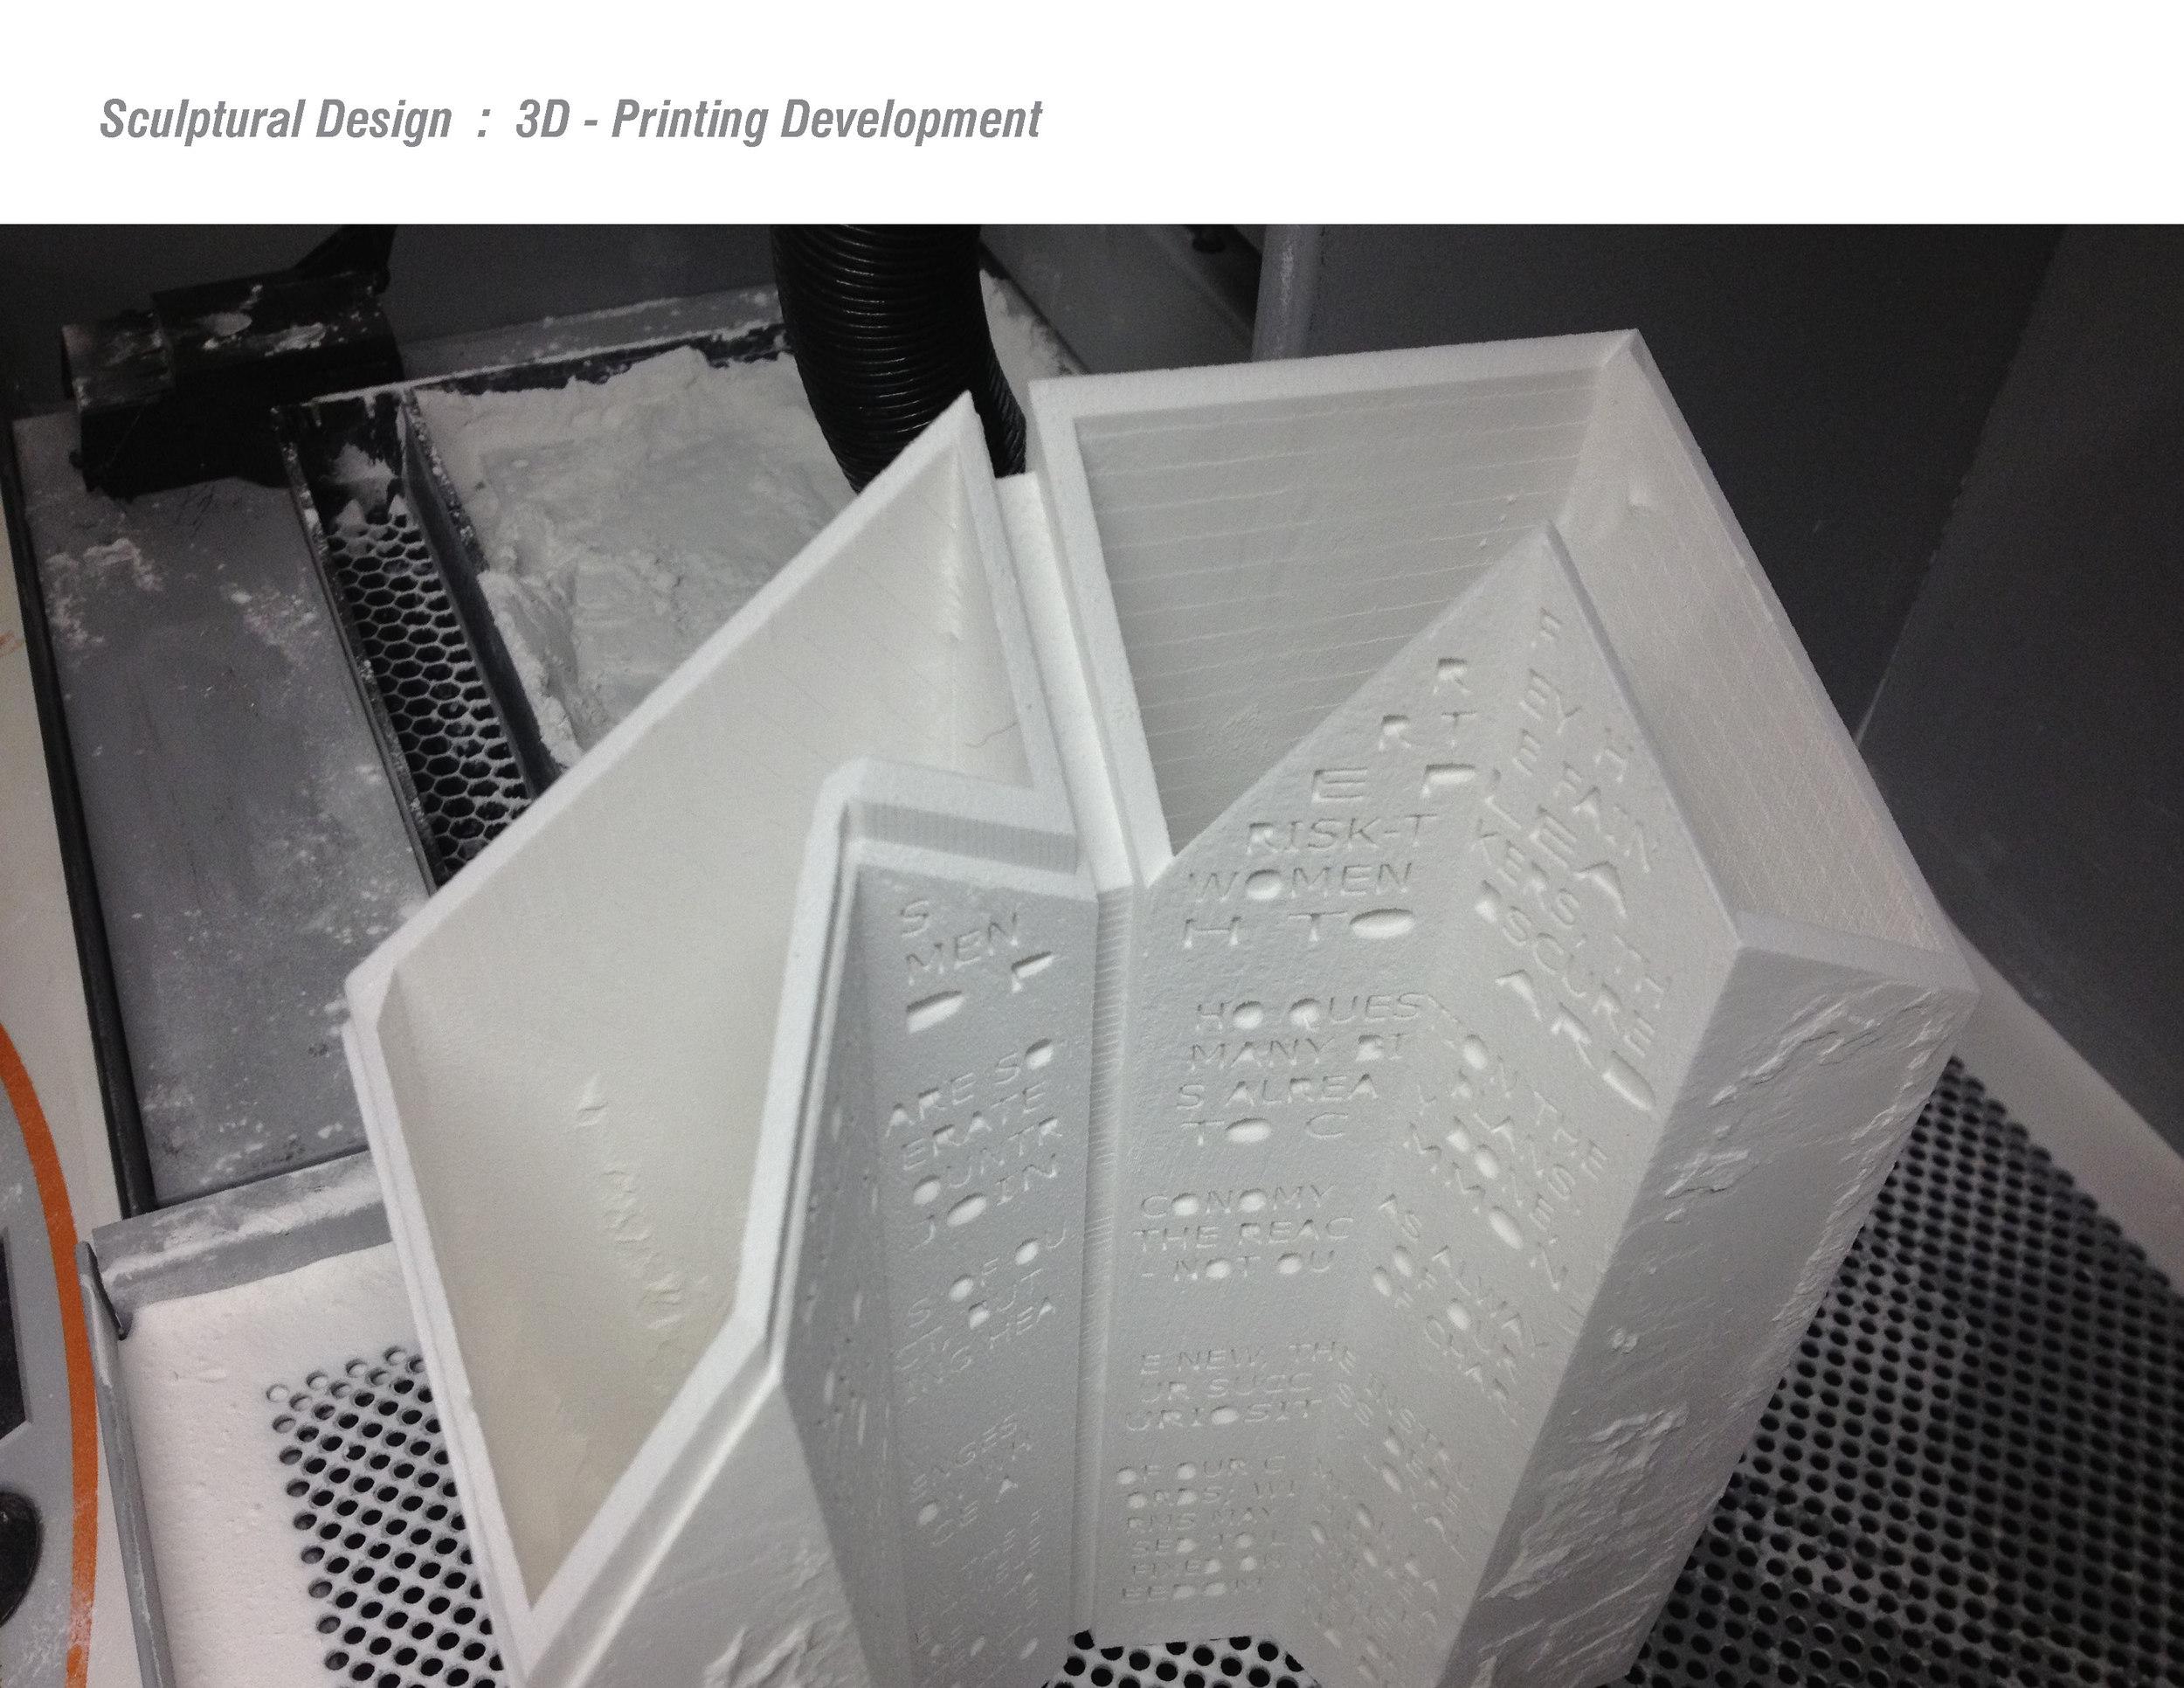 2014_0321 Matt Fajkus MF Architecture Presidential Sculpture_Page_8.jpg